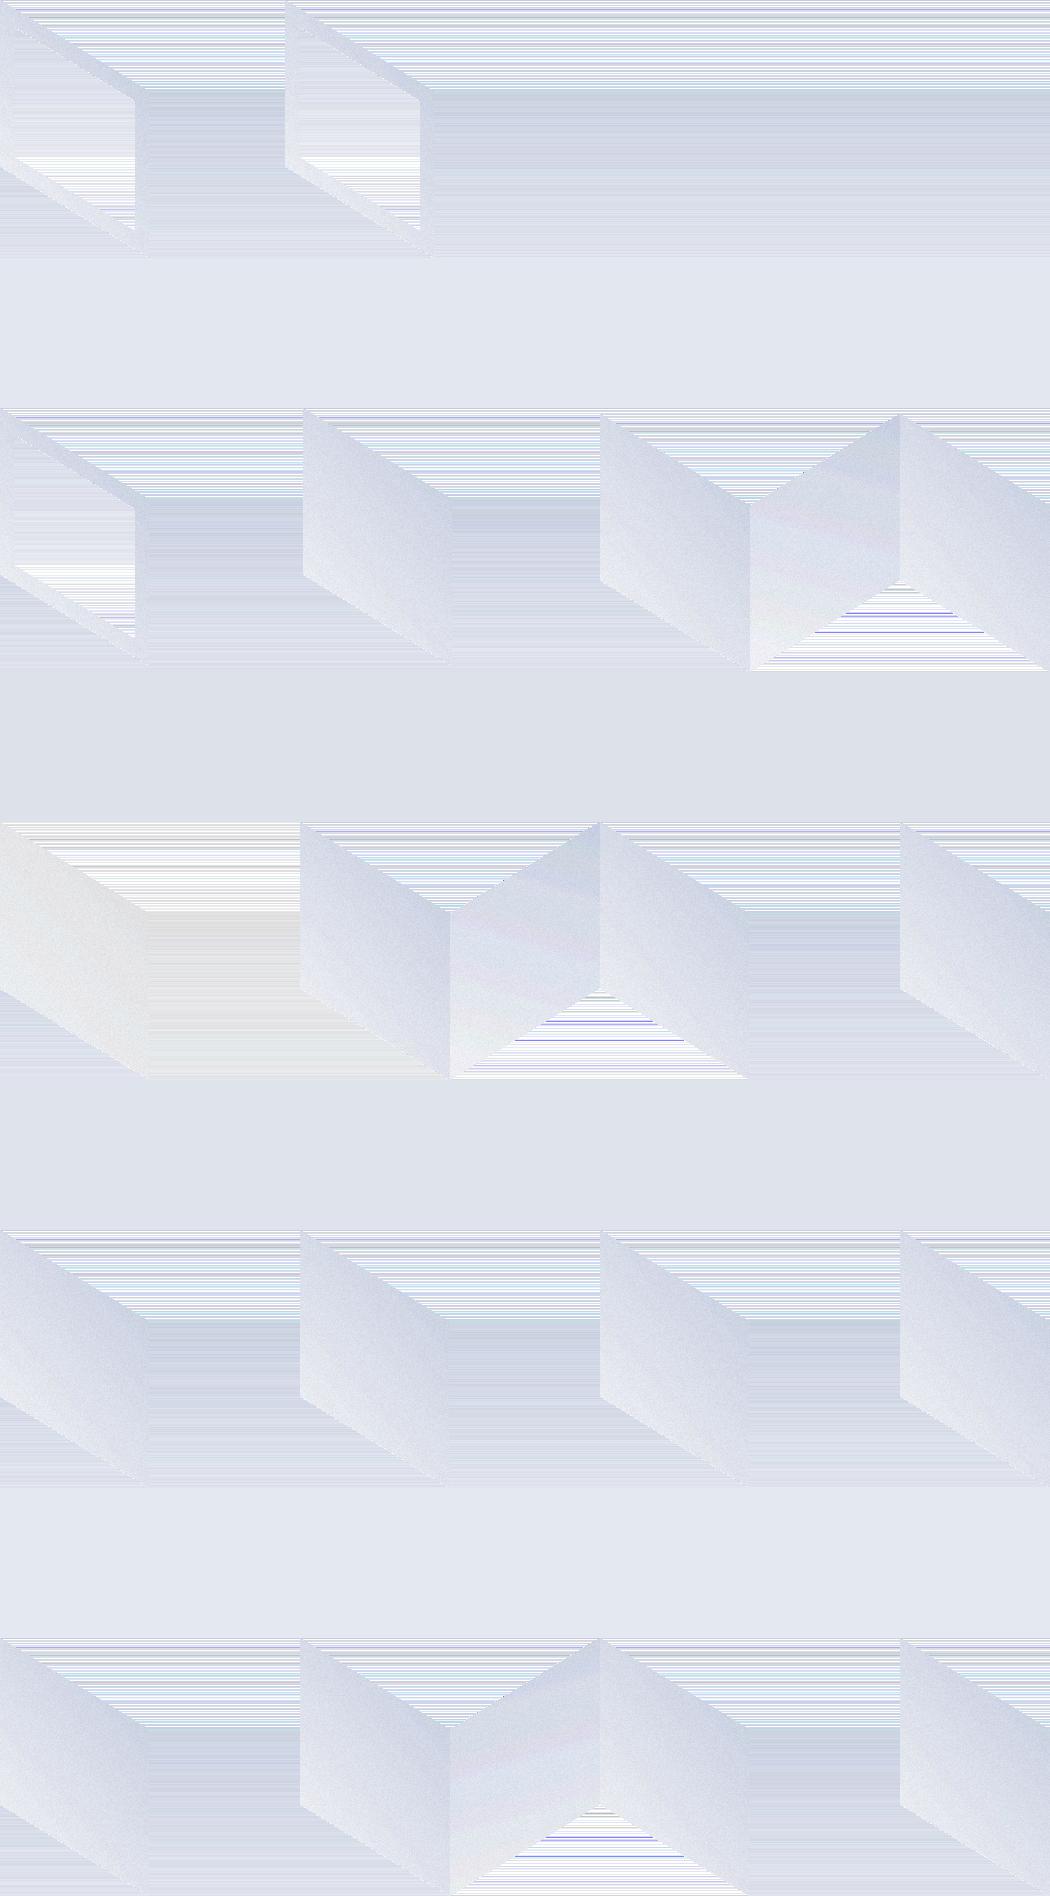 poygon-illustration 2.png